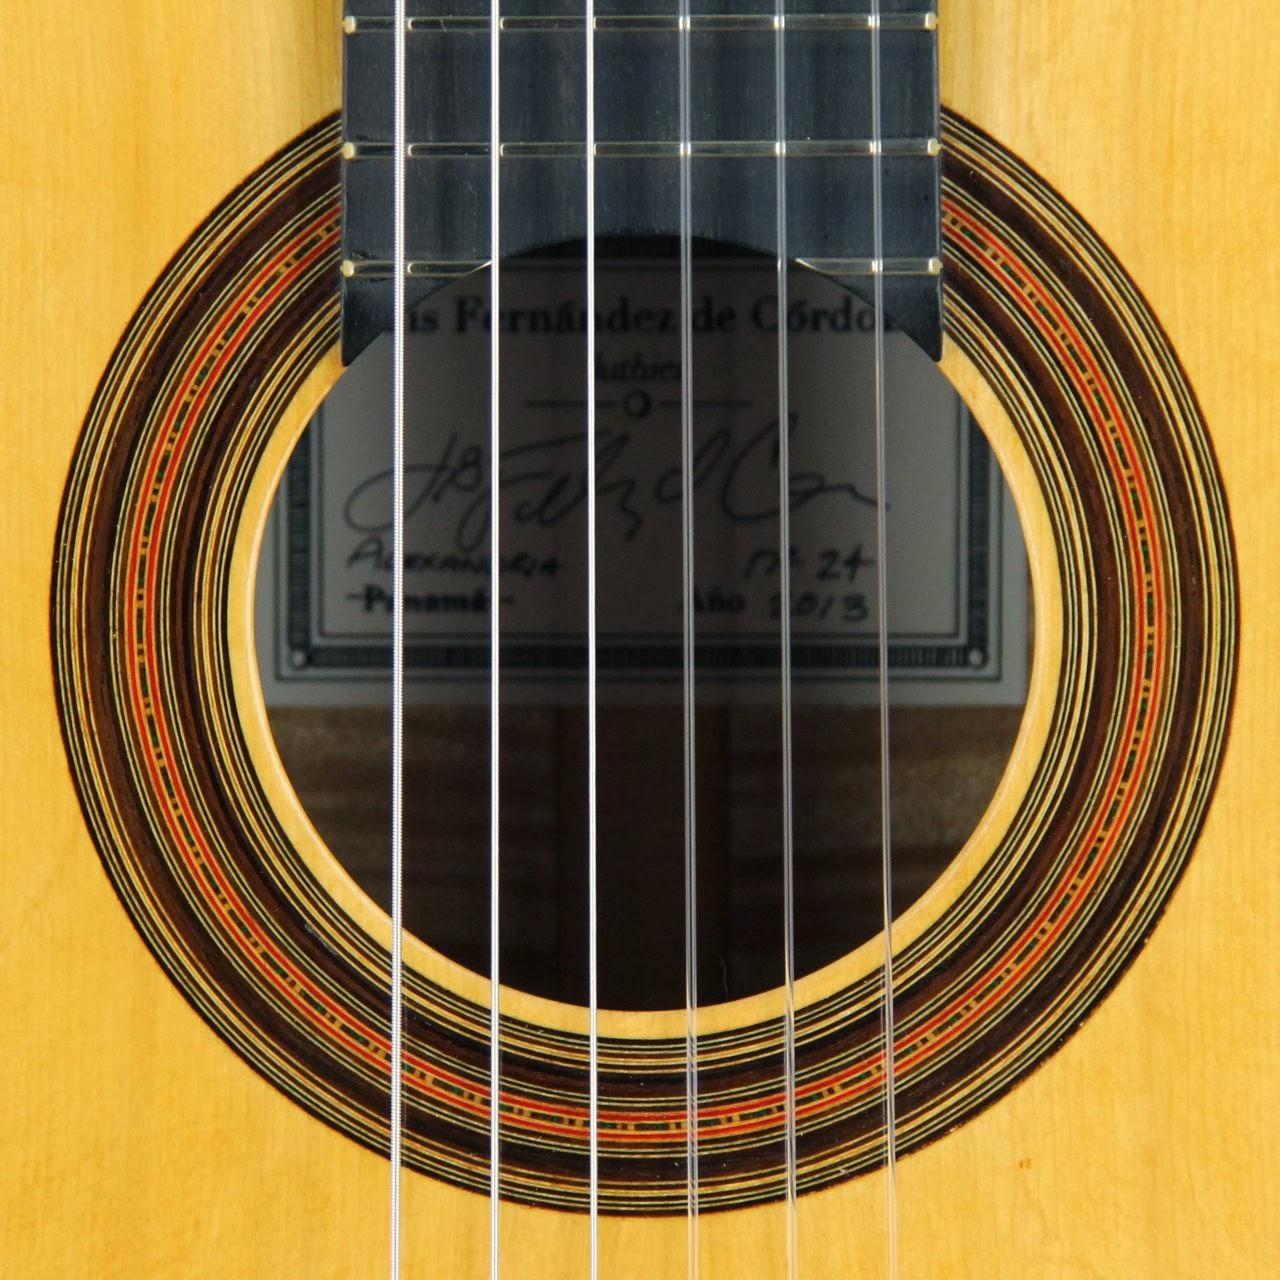 luis fern ndez de c rdoba luthier archive guitar no 24 classical. Black Bedroom Furniture Sets. Home Design Ideas